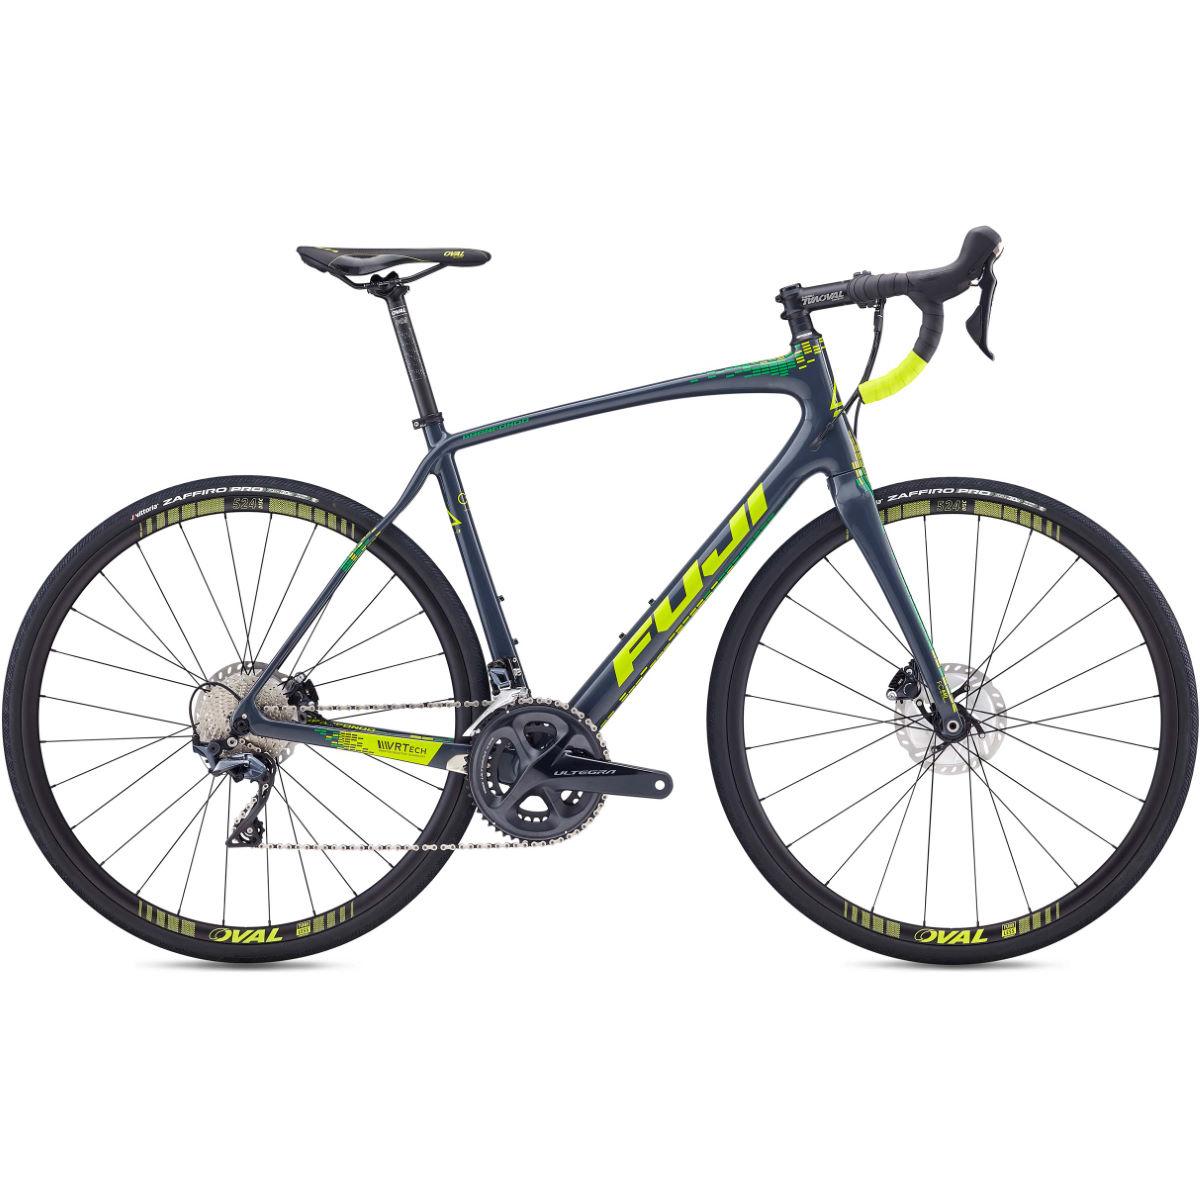 Fuji Gran Fondo 1.3 2020 Bikes